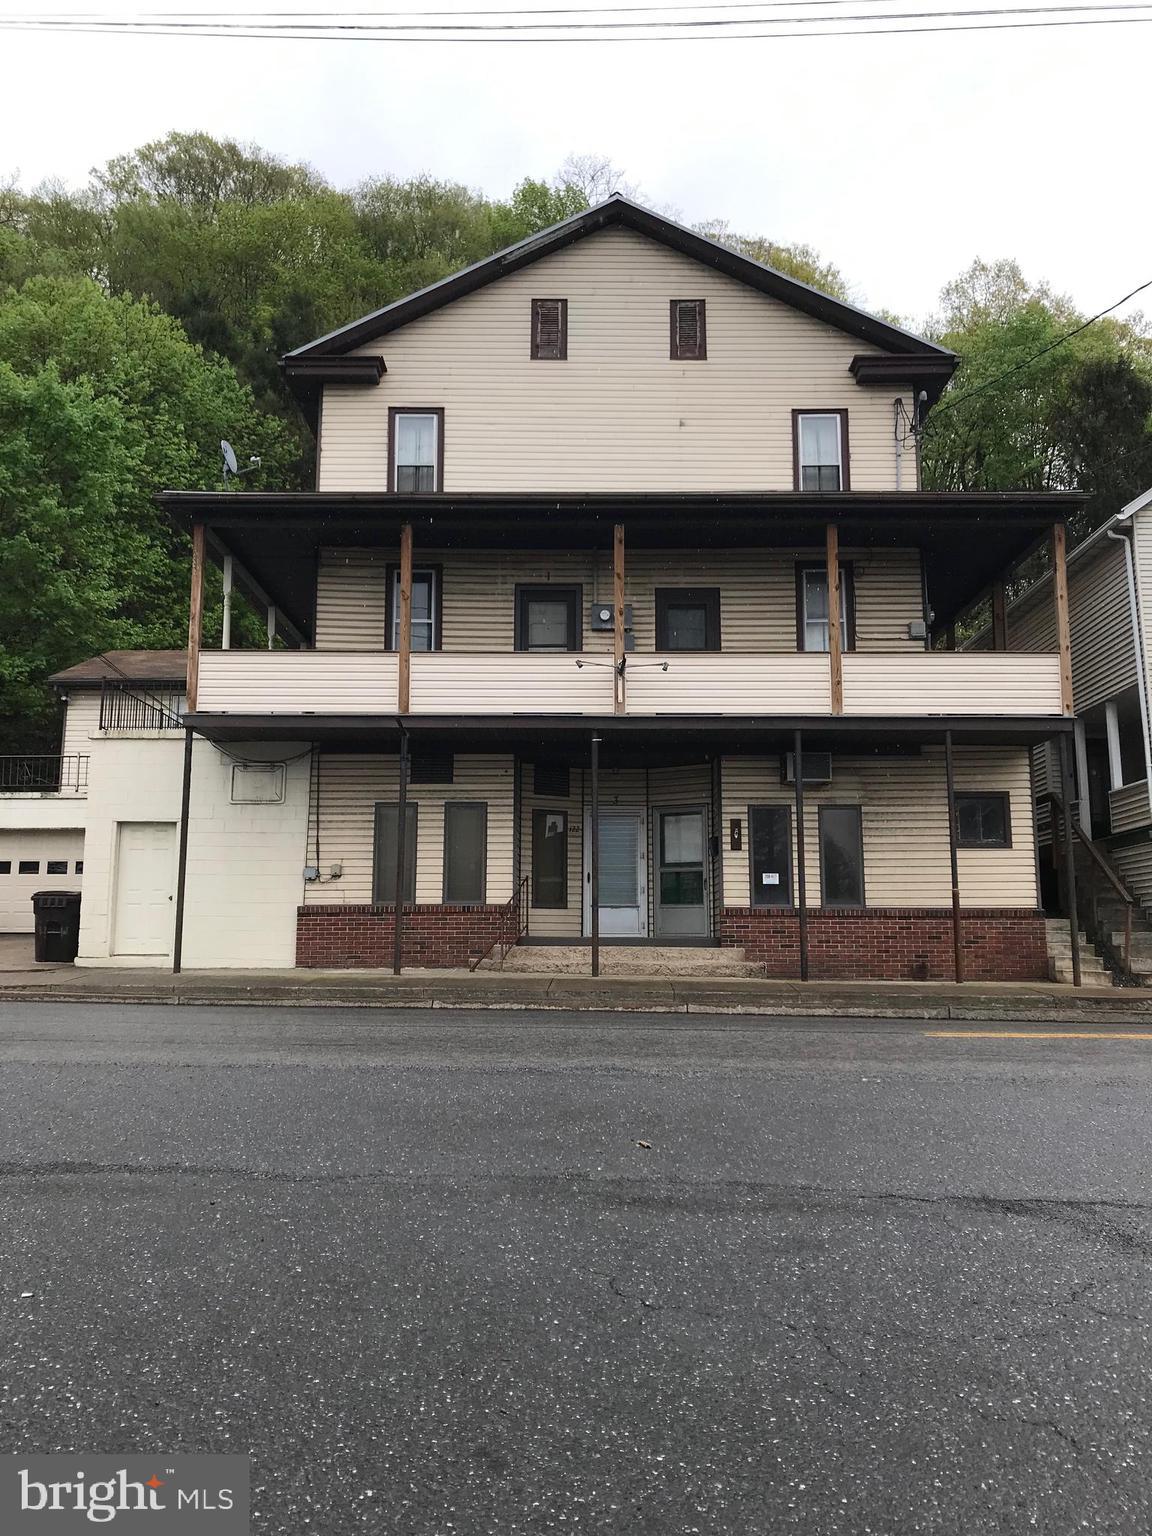 122 N MAIN STREET, HERNDON, PA 17830